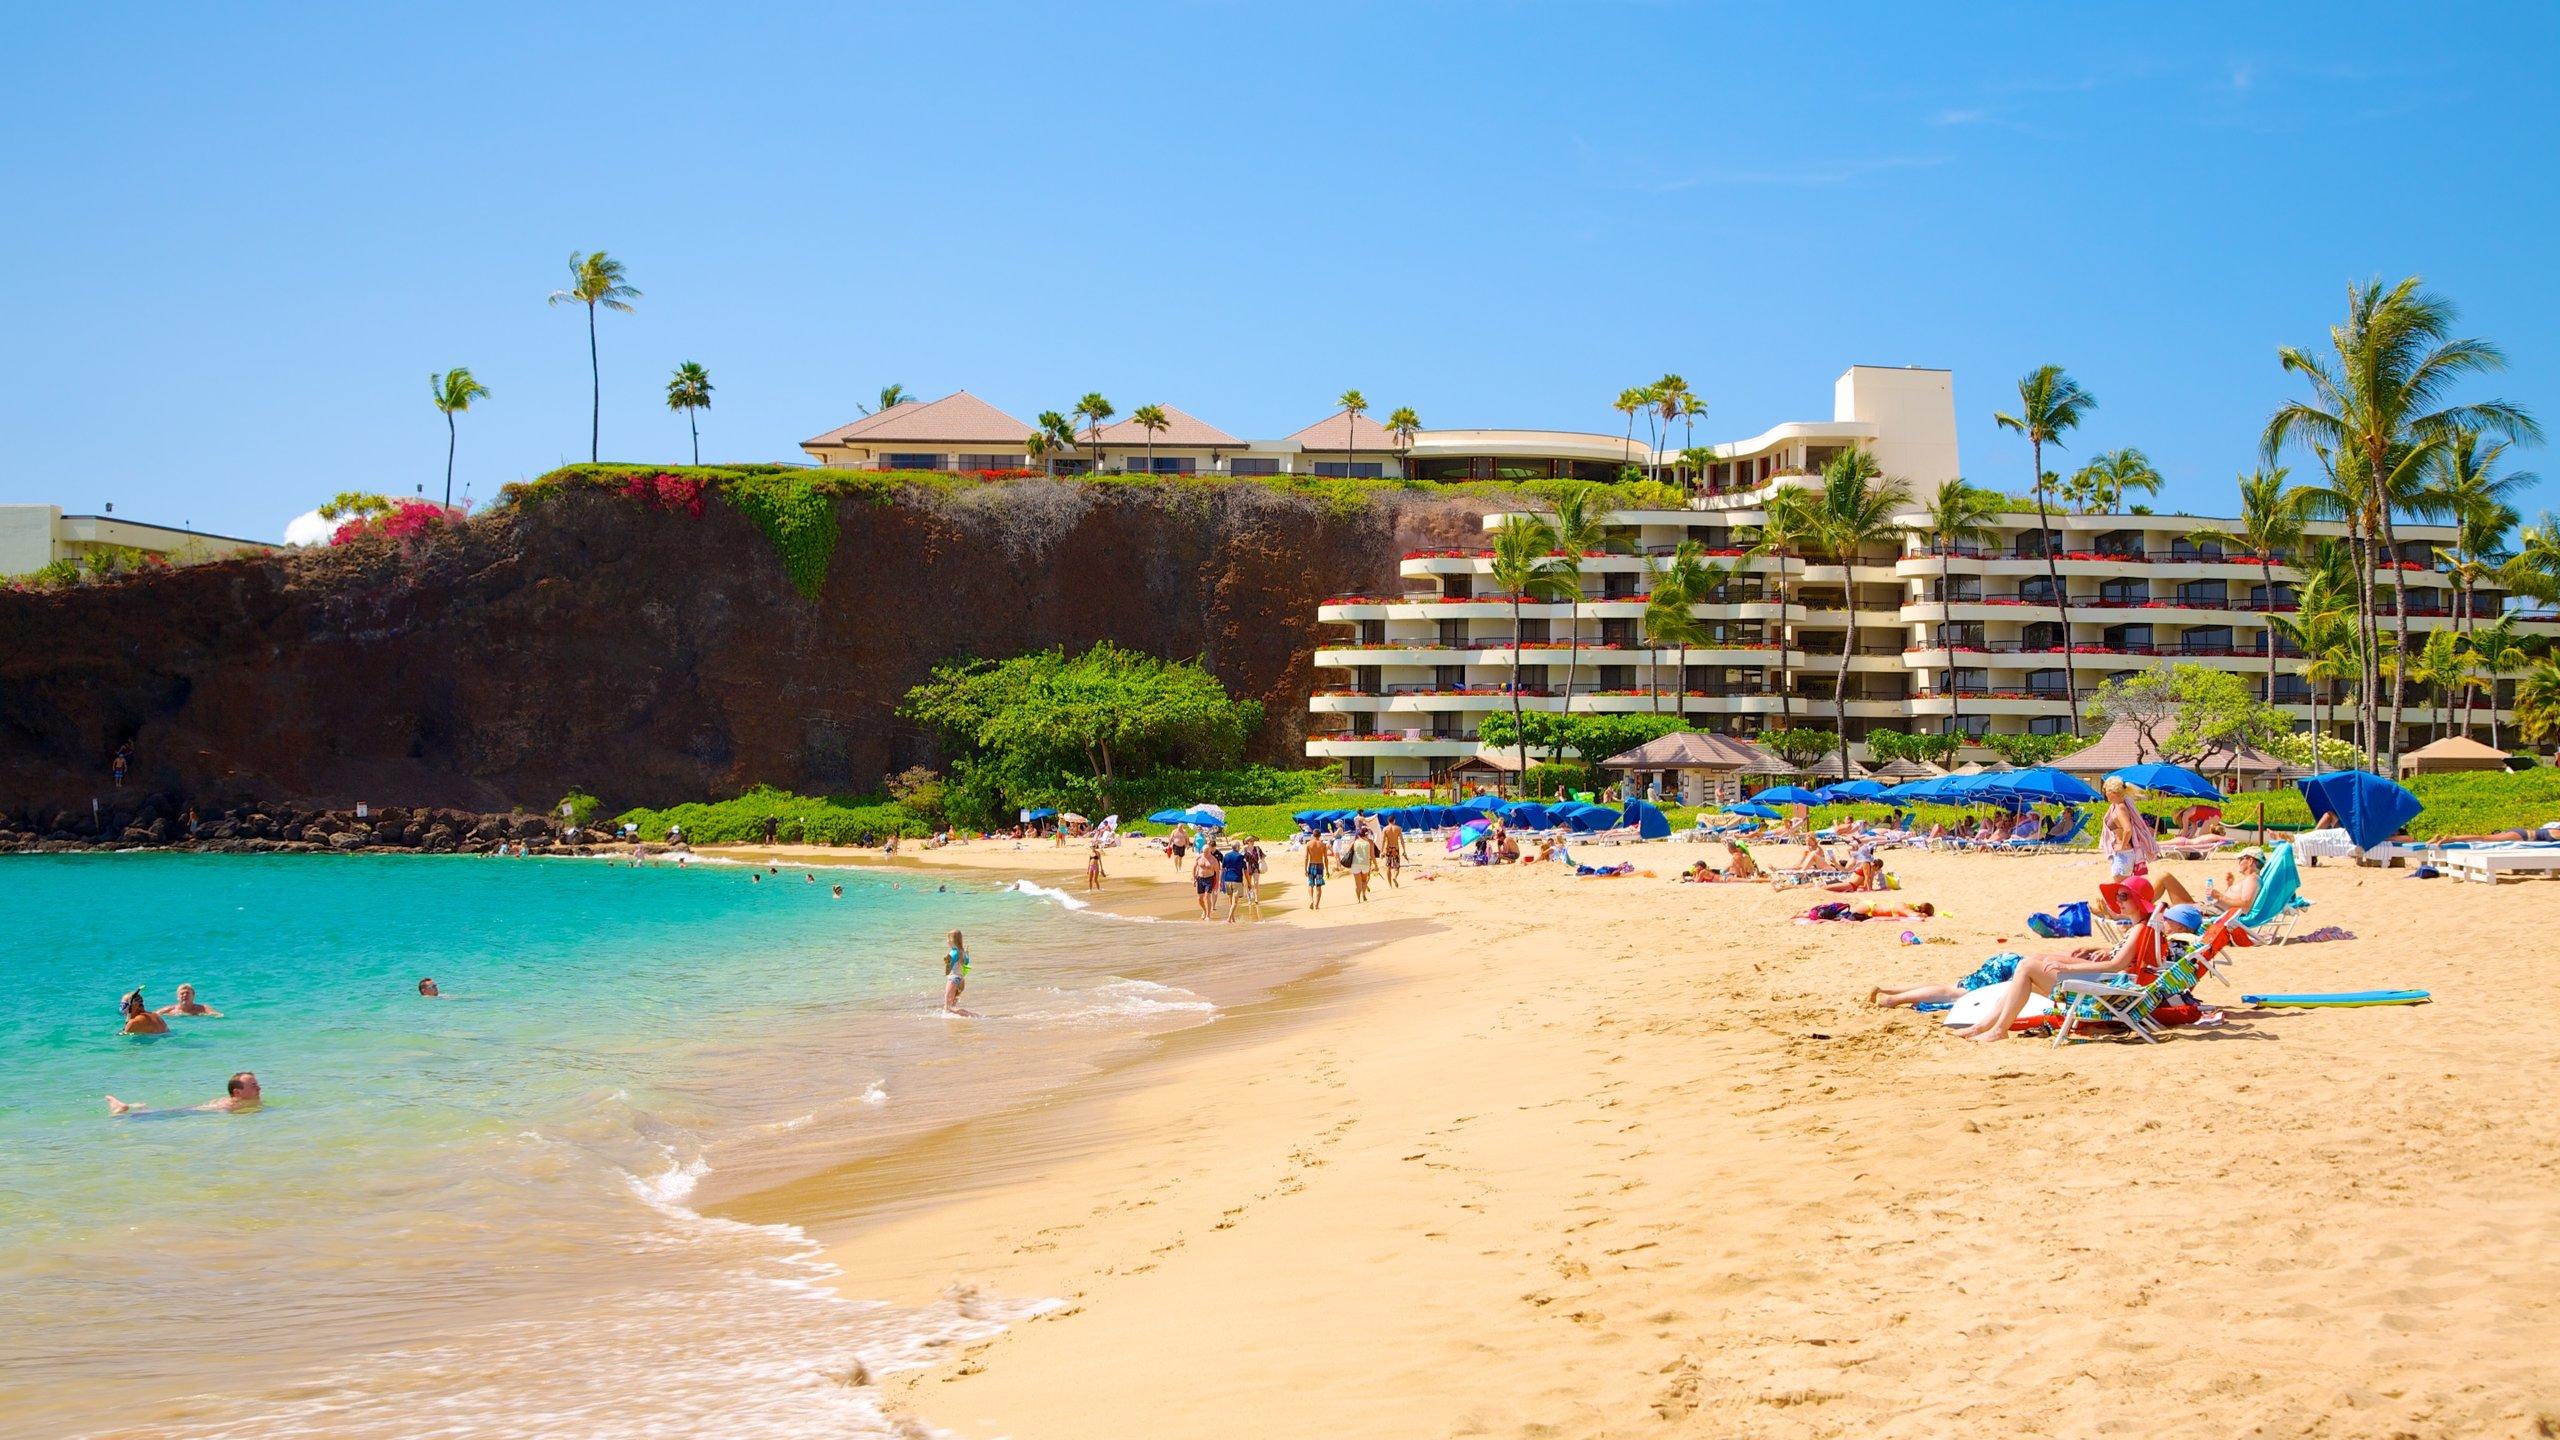 Kaanapali Beach, Lahaina, Hawaii, United States of America